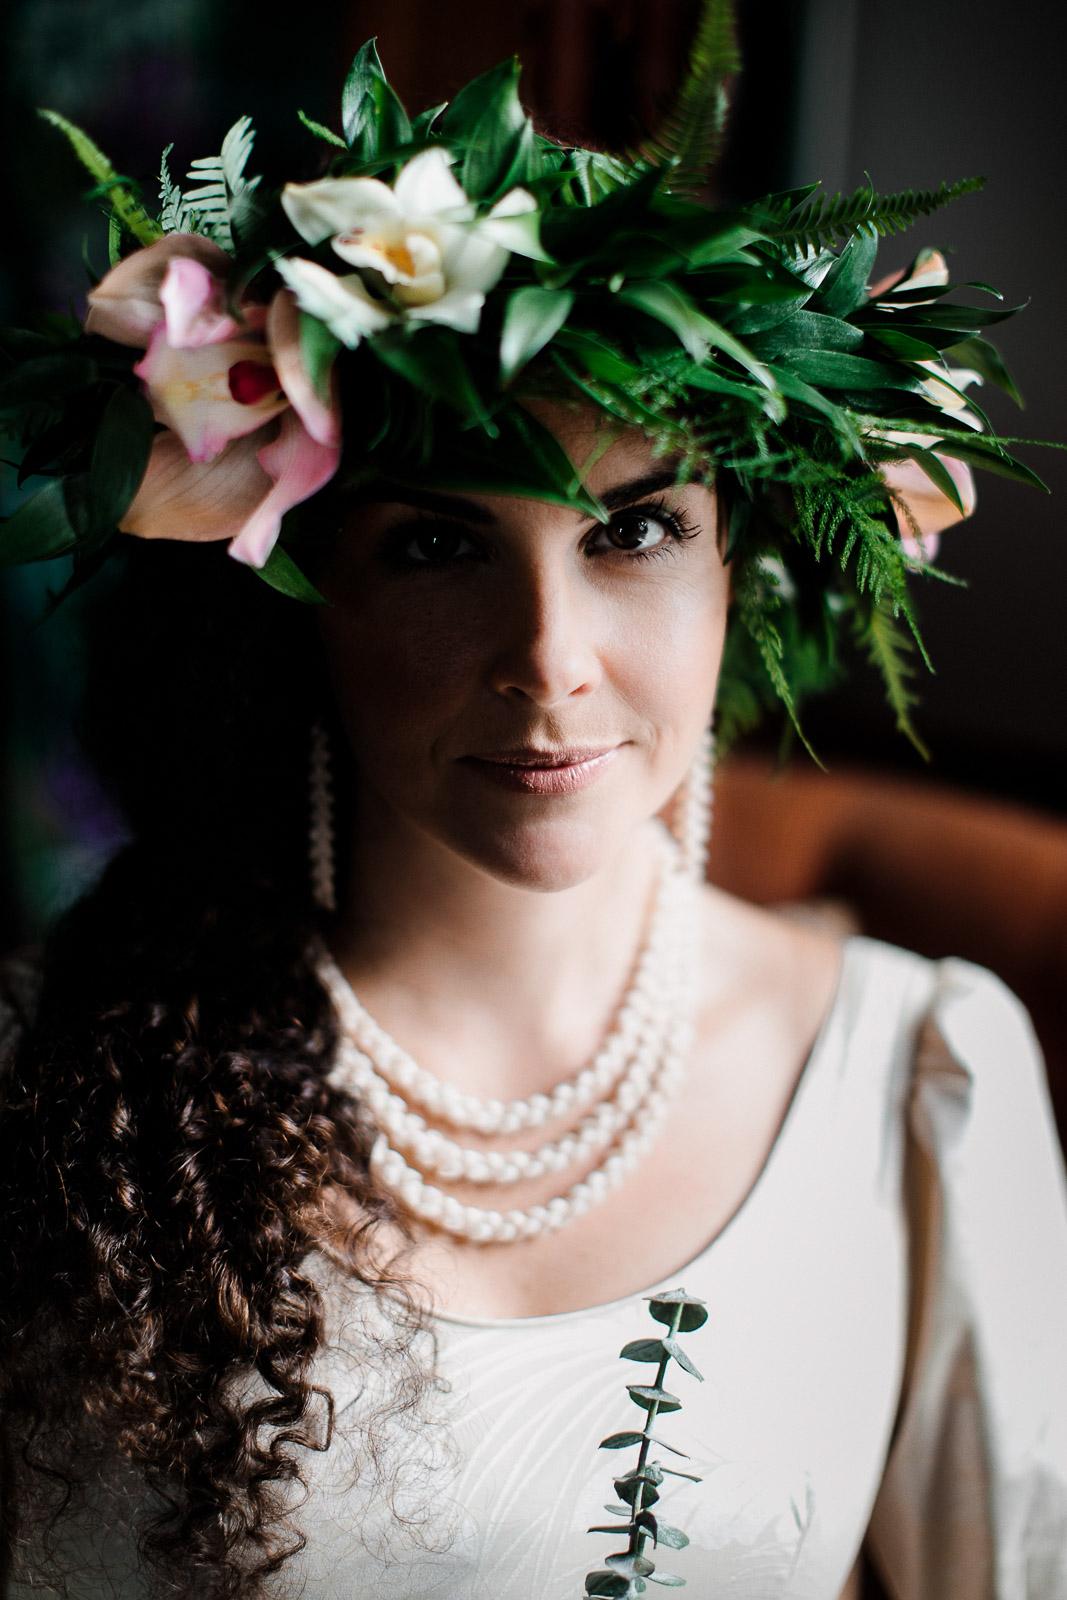 documentary-wedding-alternative-photographer-ireland-katie-farrell0207